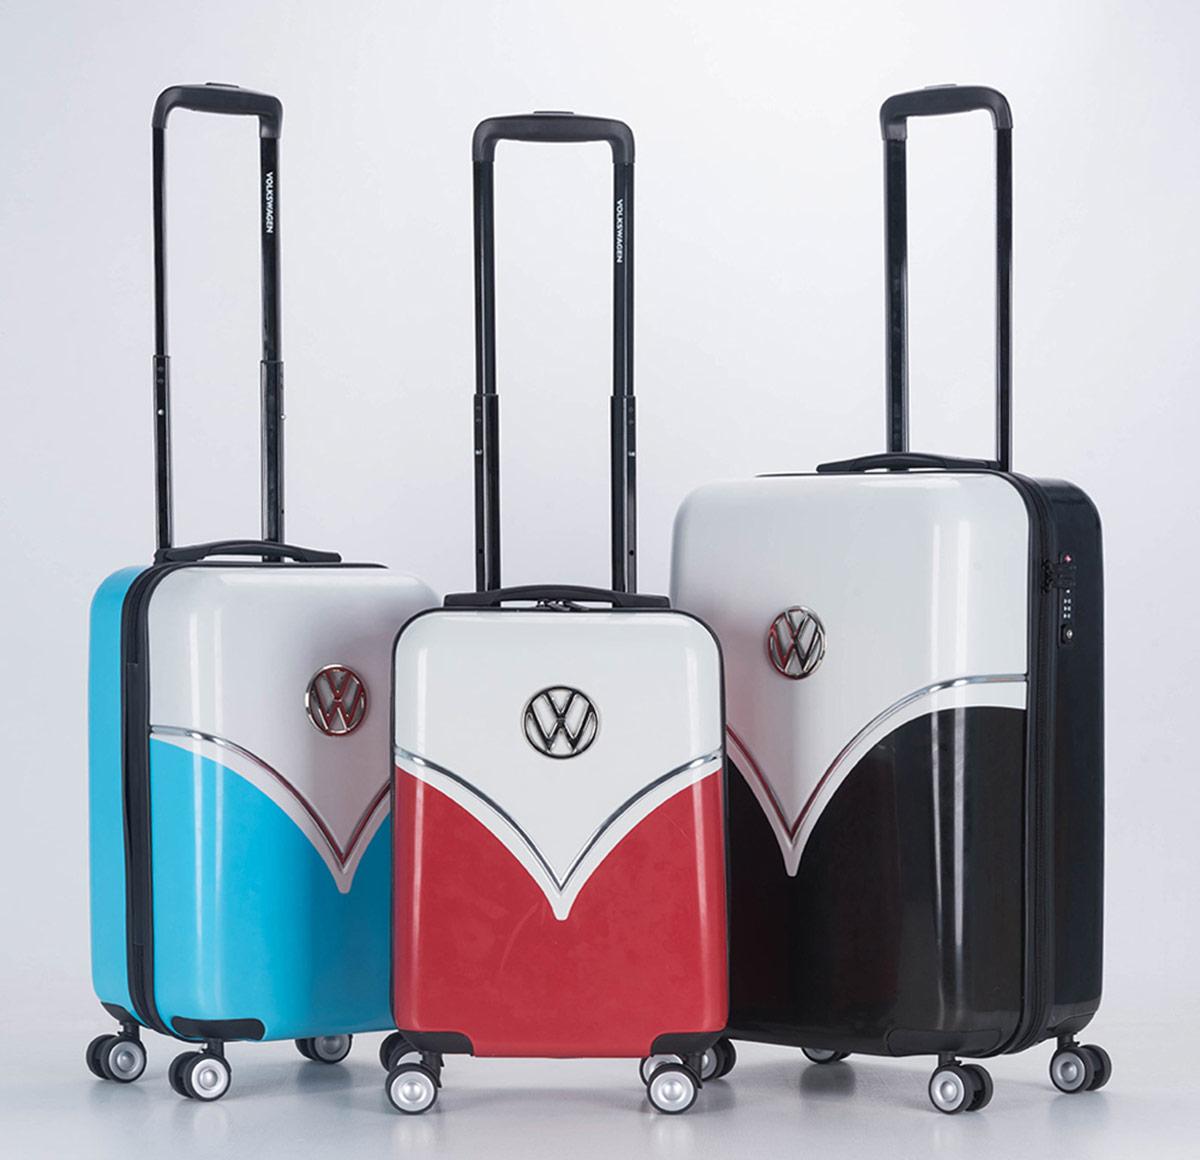 trommer volkswagen bolan trolleys t1 prototypes